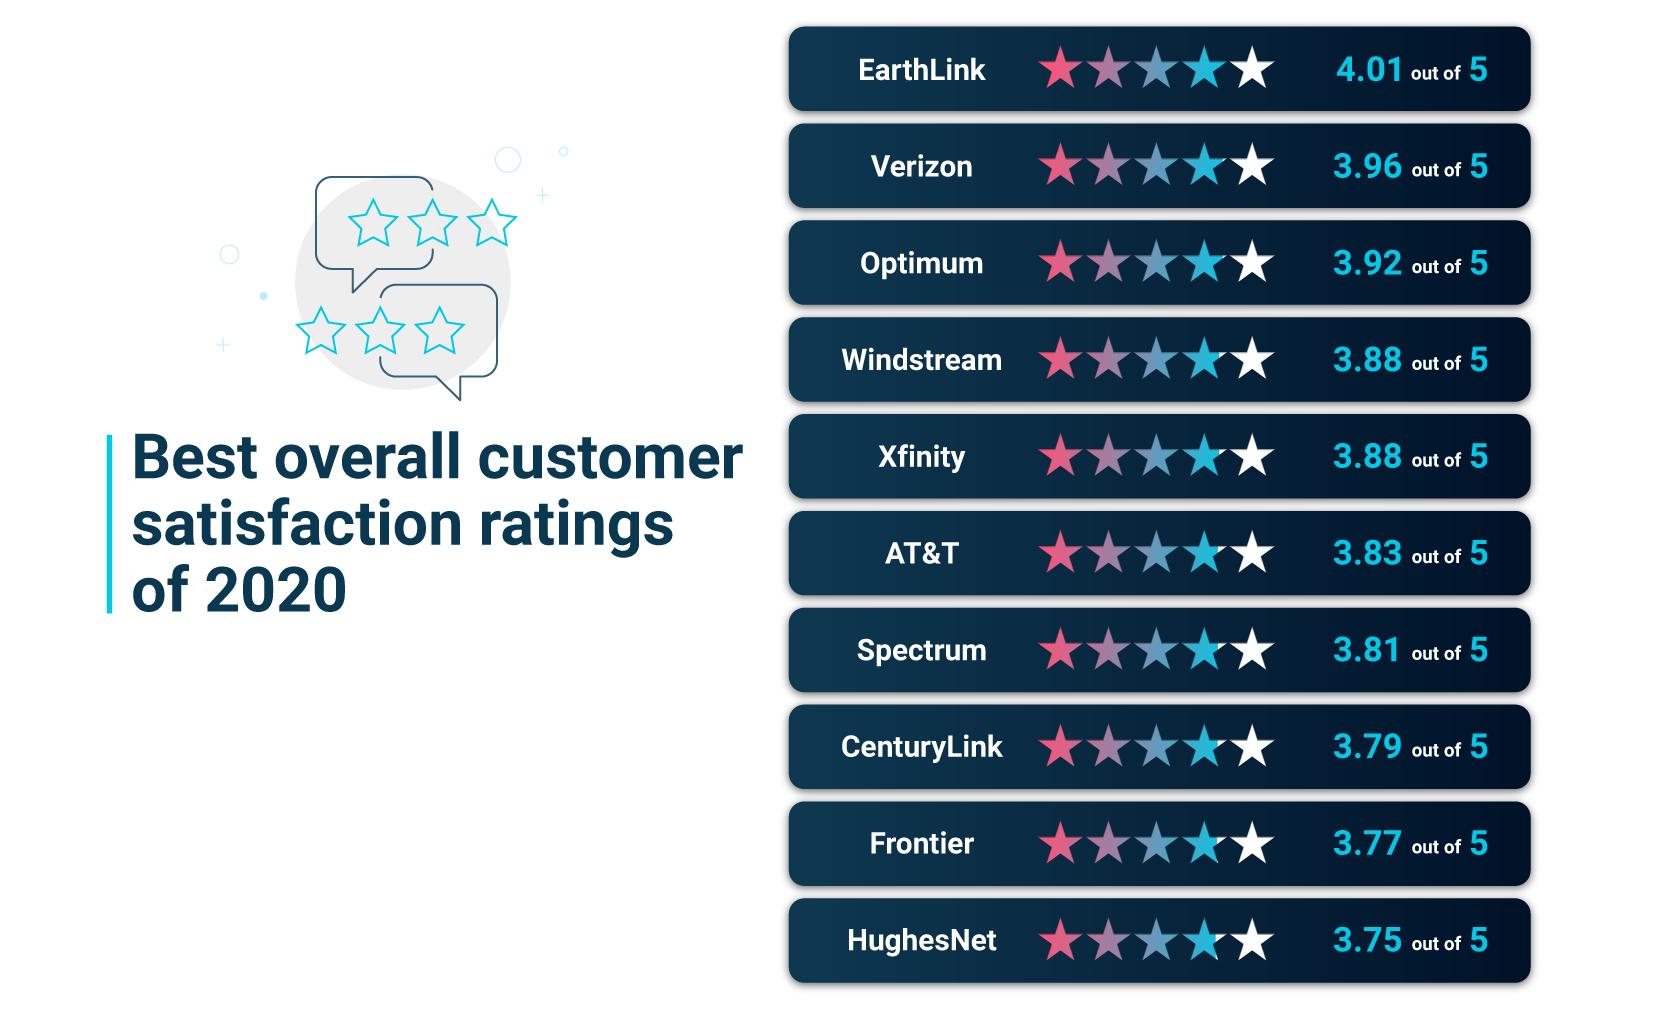 Overall customer satisfaction ratings